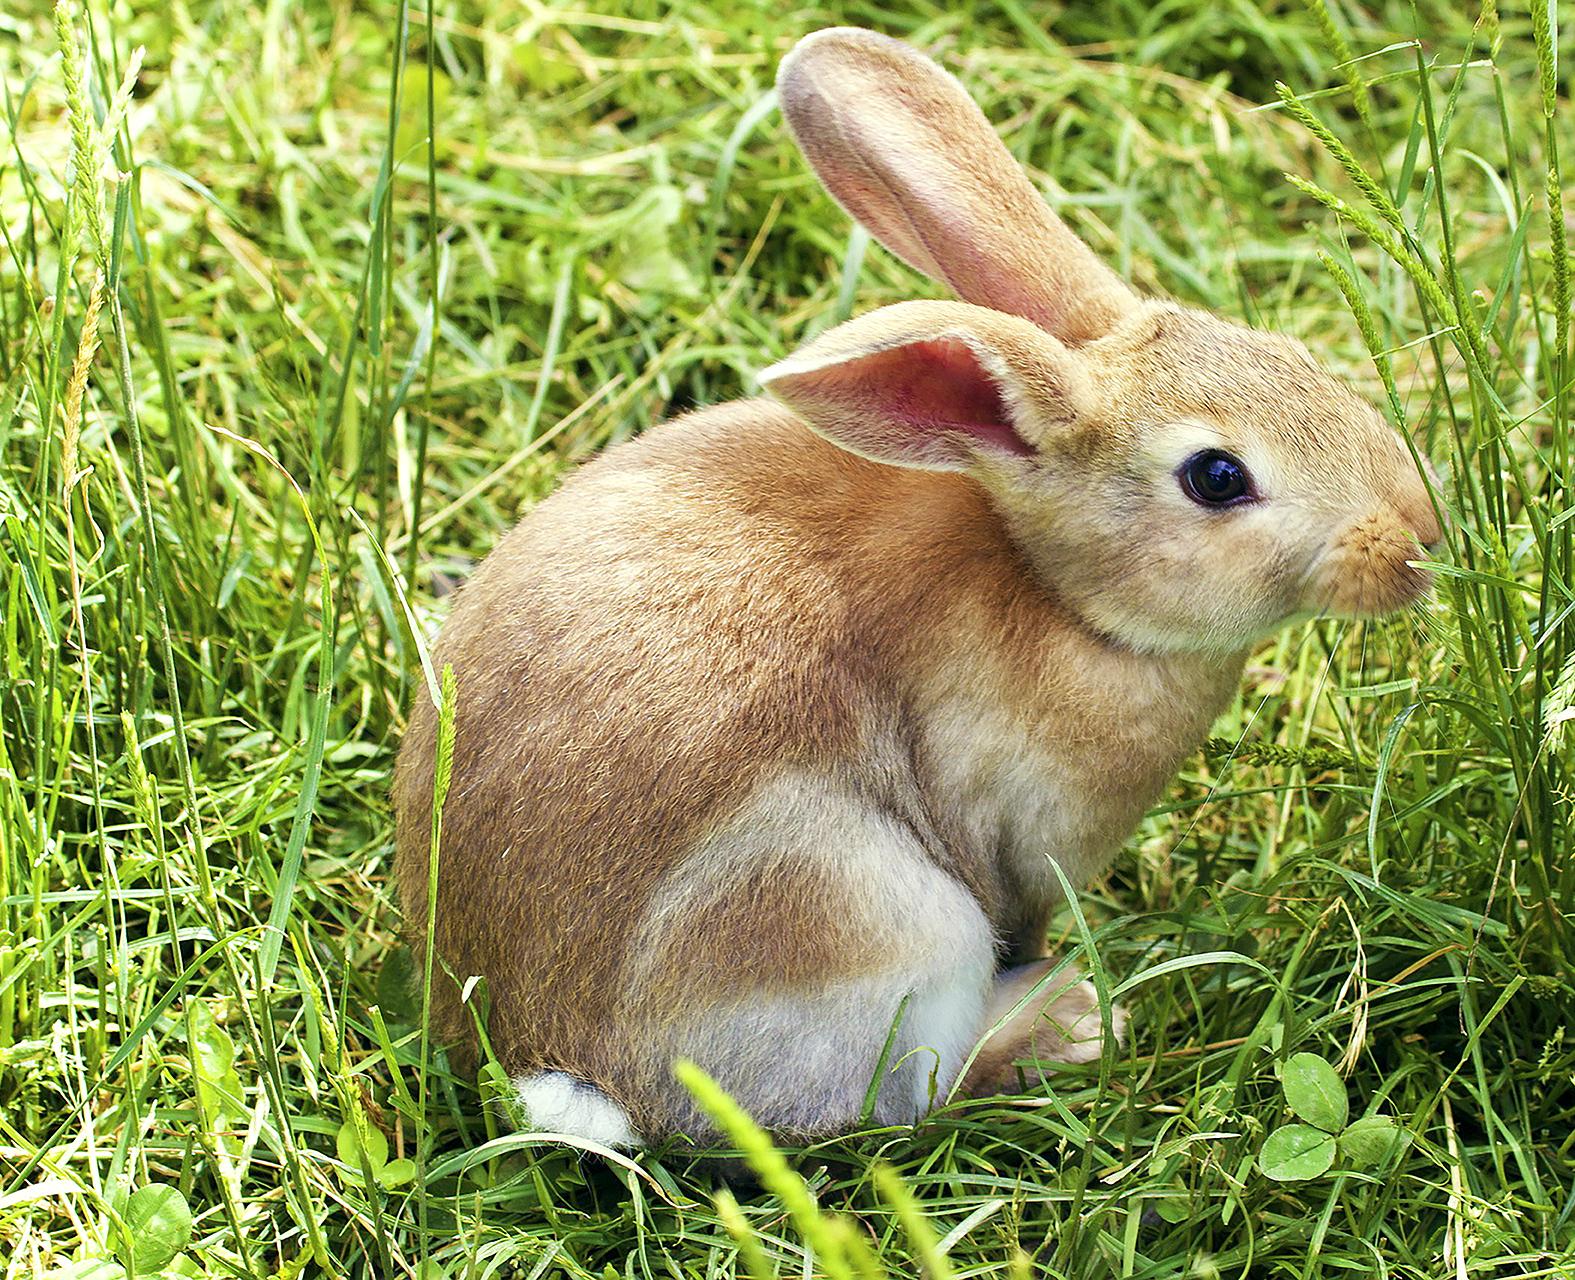 bunny-837443_1920_AGATHA-2019crpd-300-1920